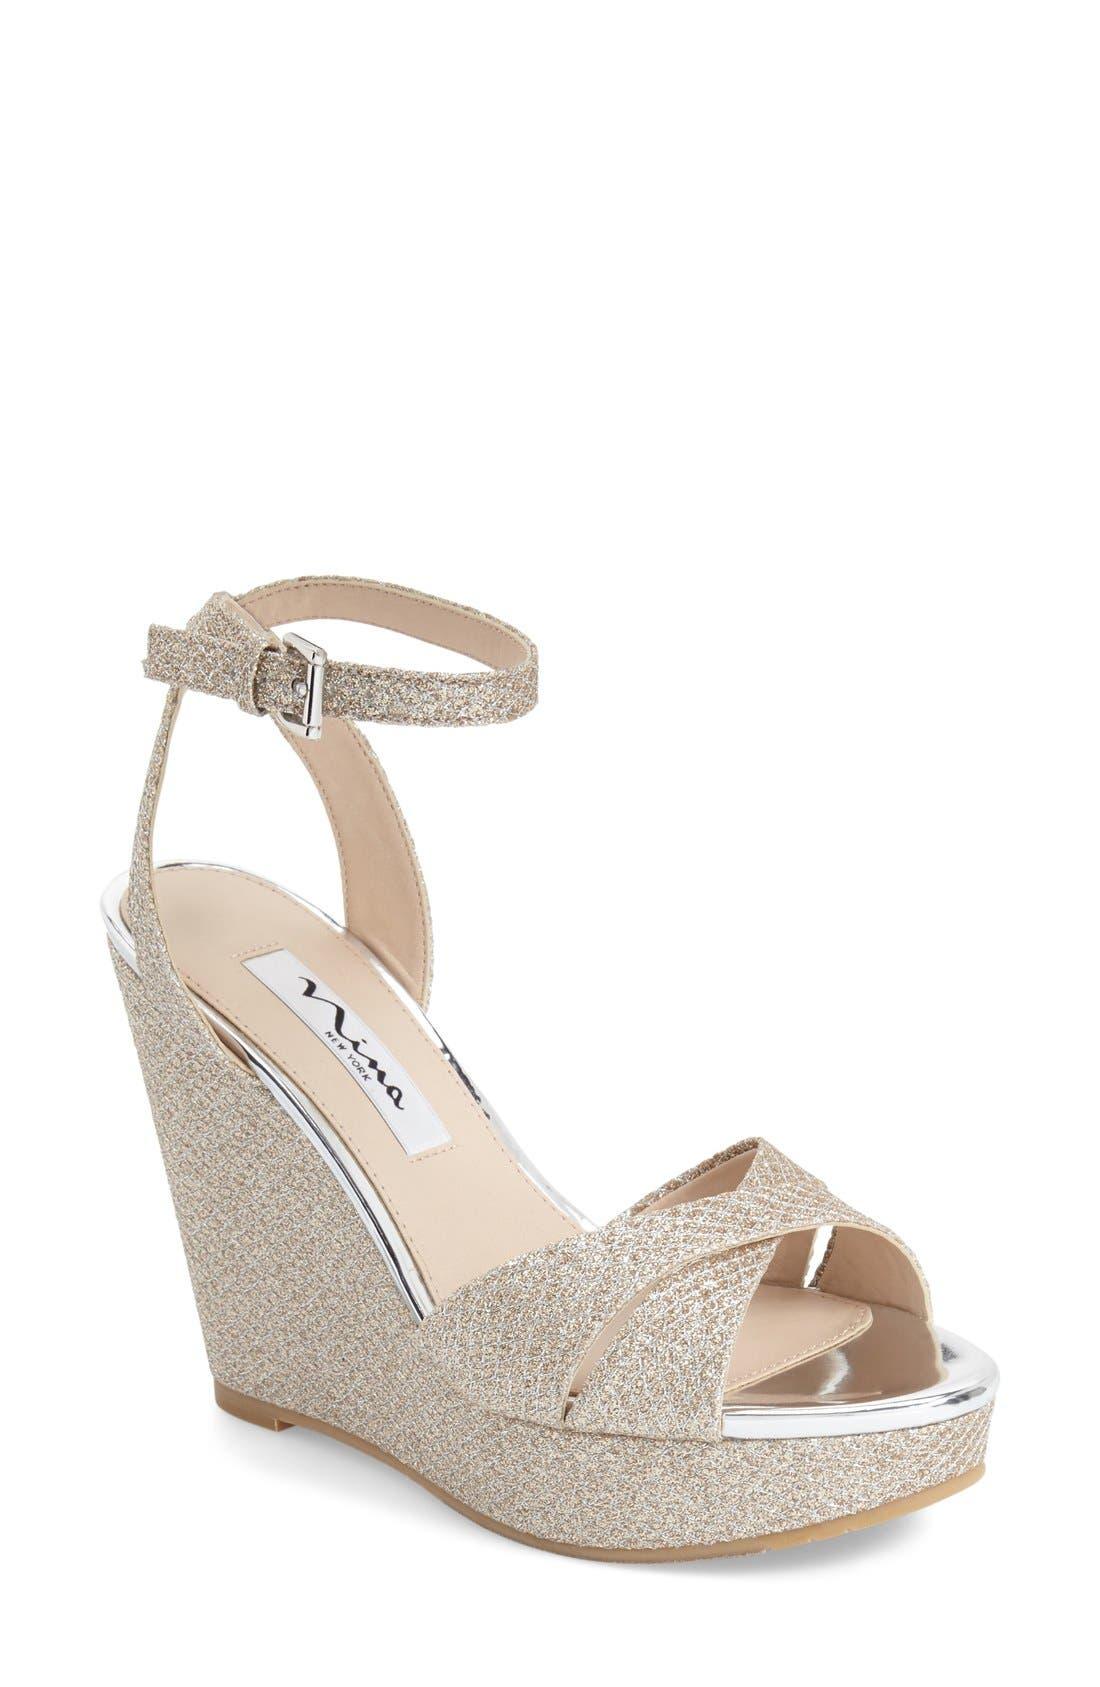 Main Image - Nina 'Gianina' Glitter Mesh Wedge Sandal (Women)